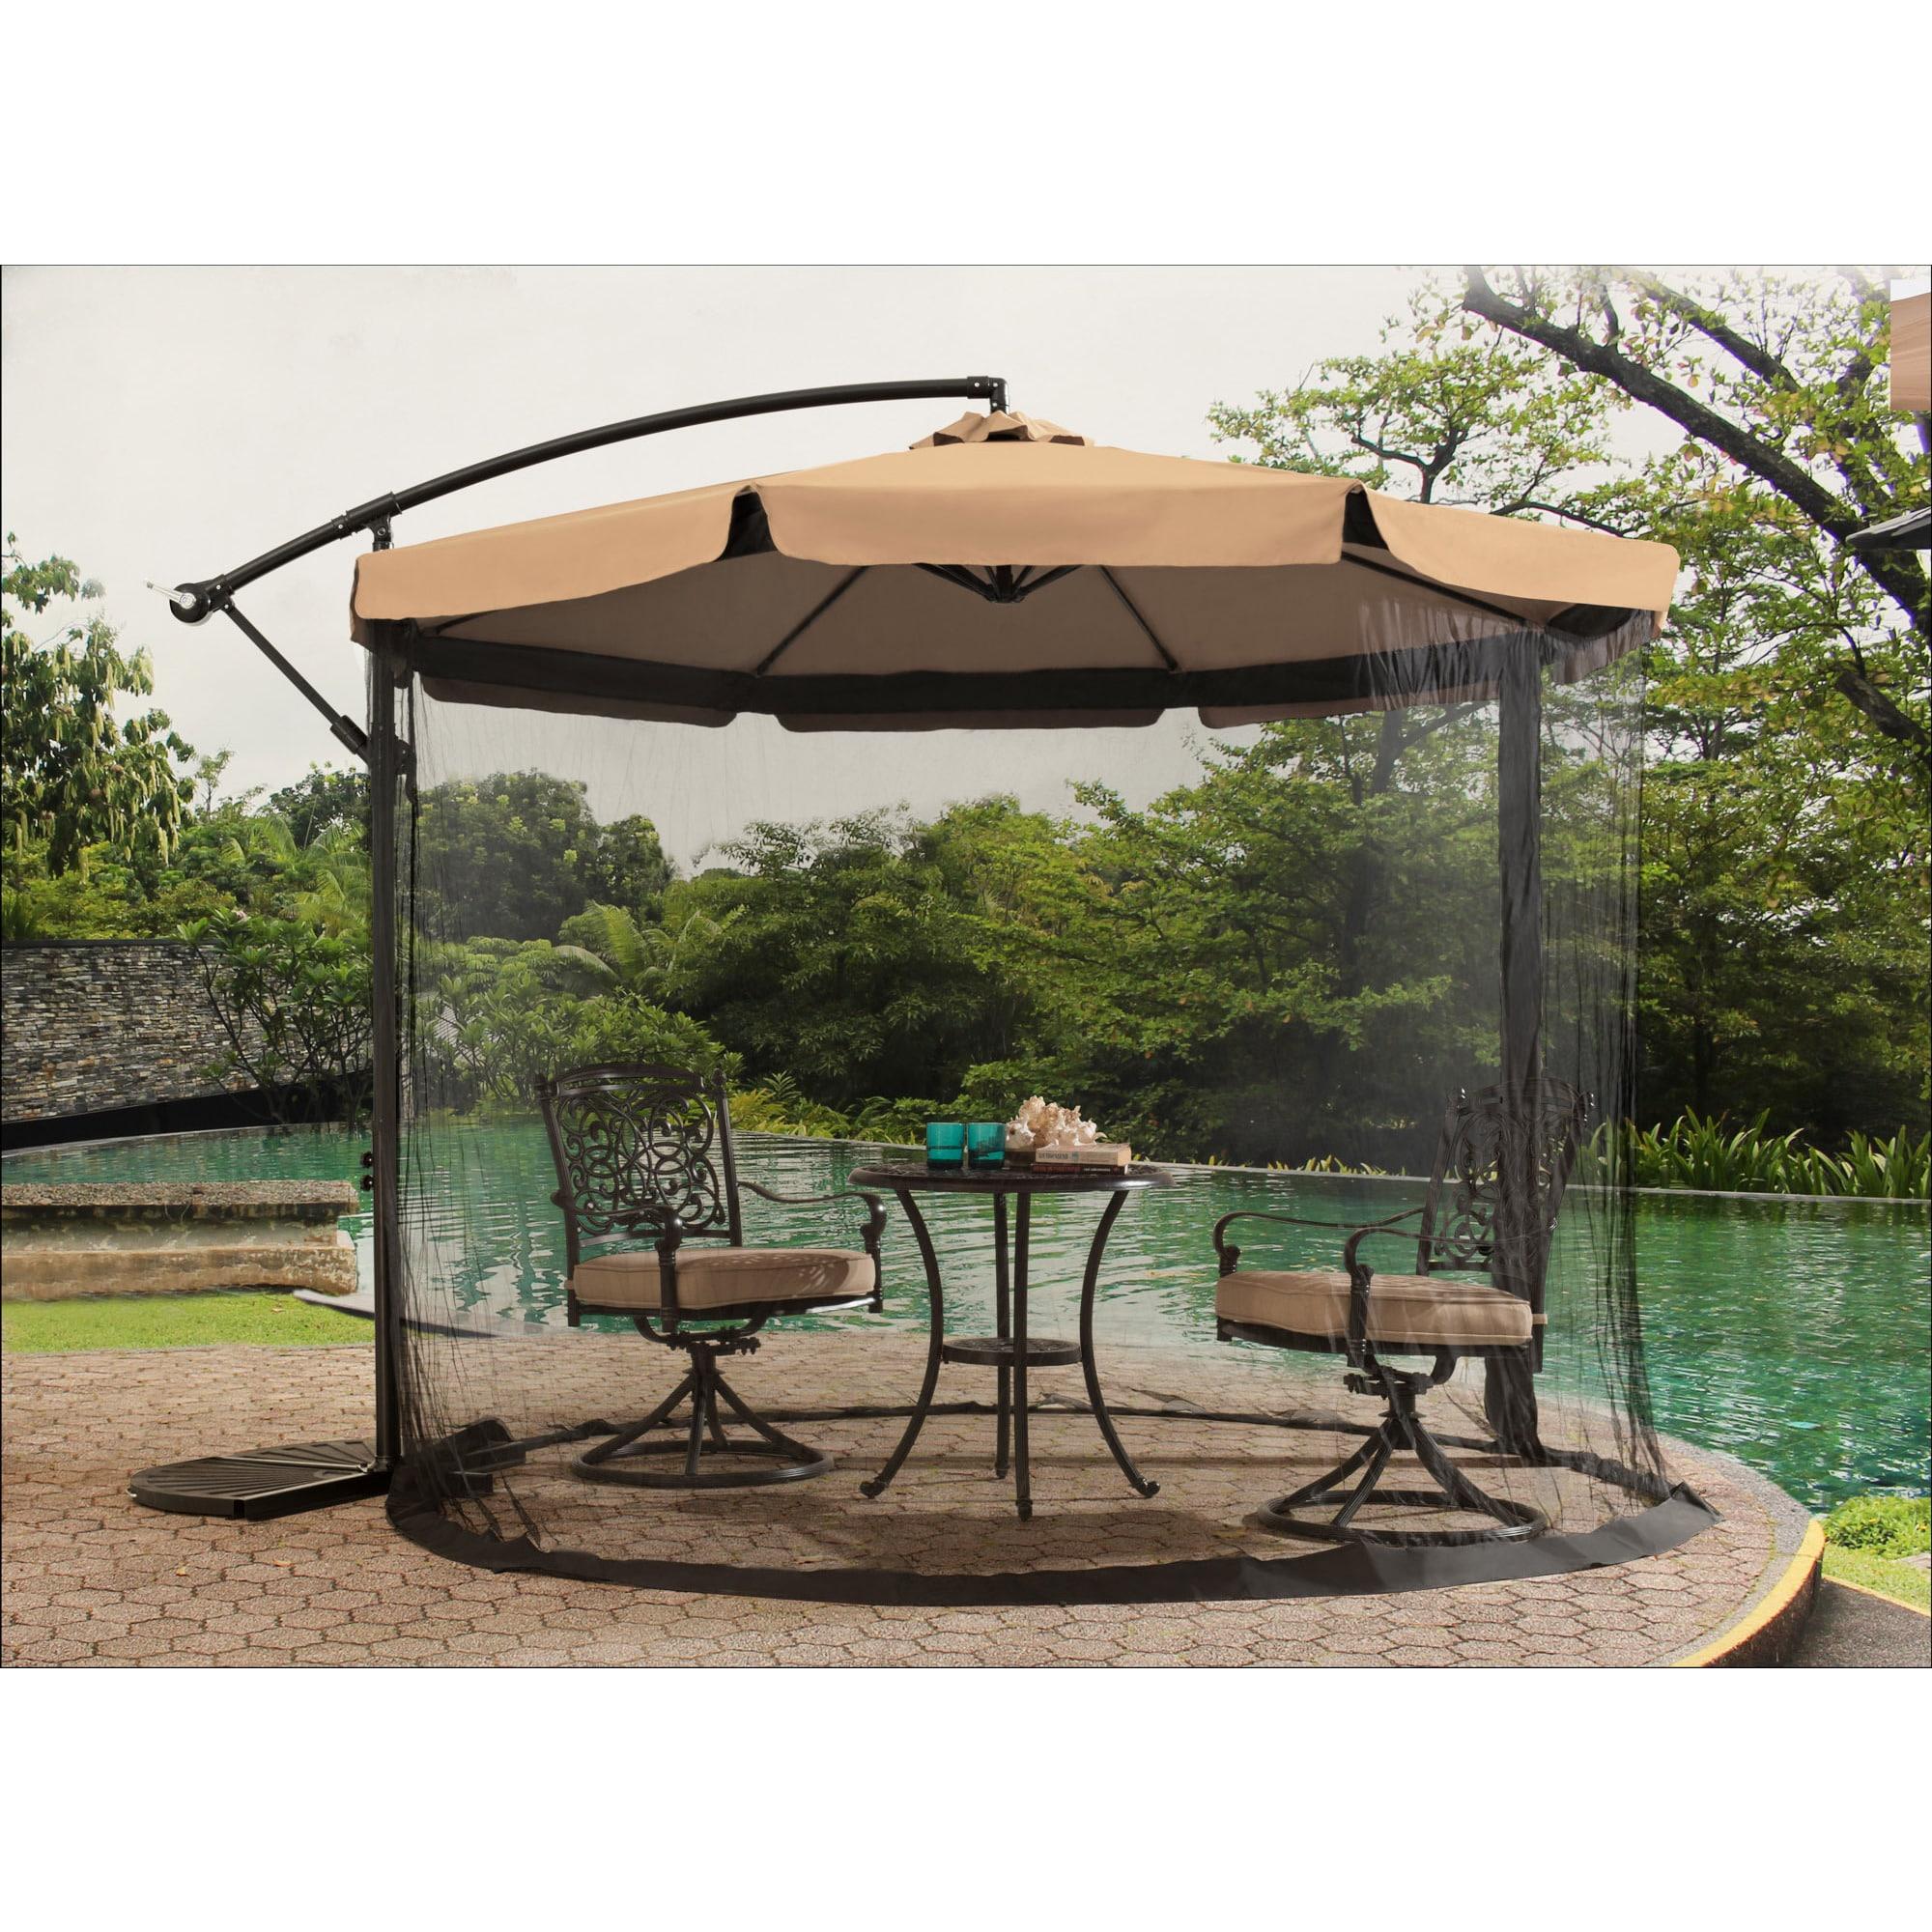 SunJoy Netted Umbrella (Brown), Black, Size 10-foot (Stee...